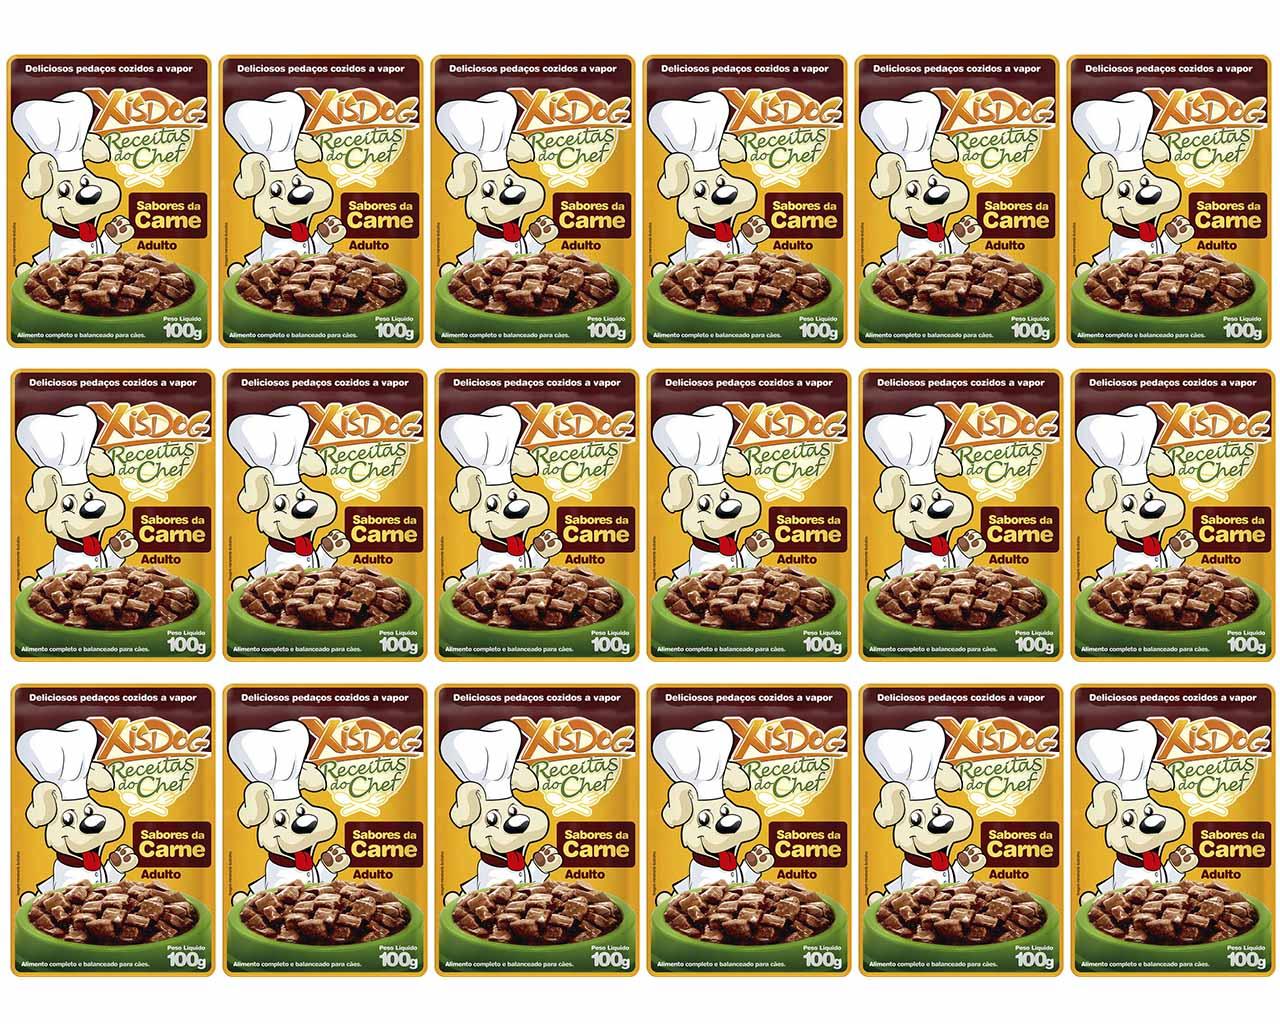 Sachê de Carne Alimento úmido para cães Adulto 100g Receitas do Chef XisDog Caixa 18 unidades 100g